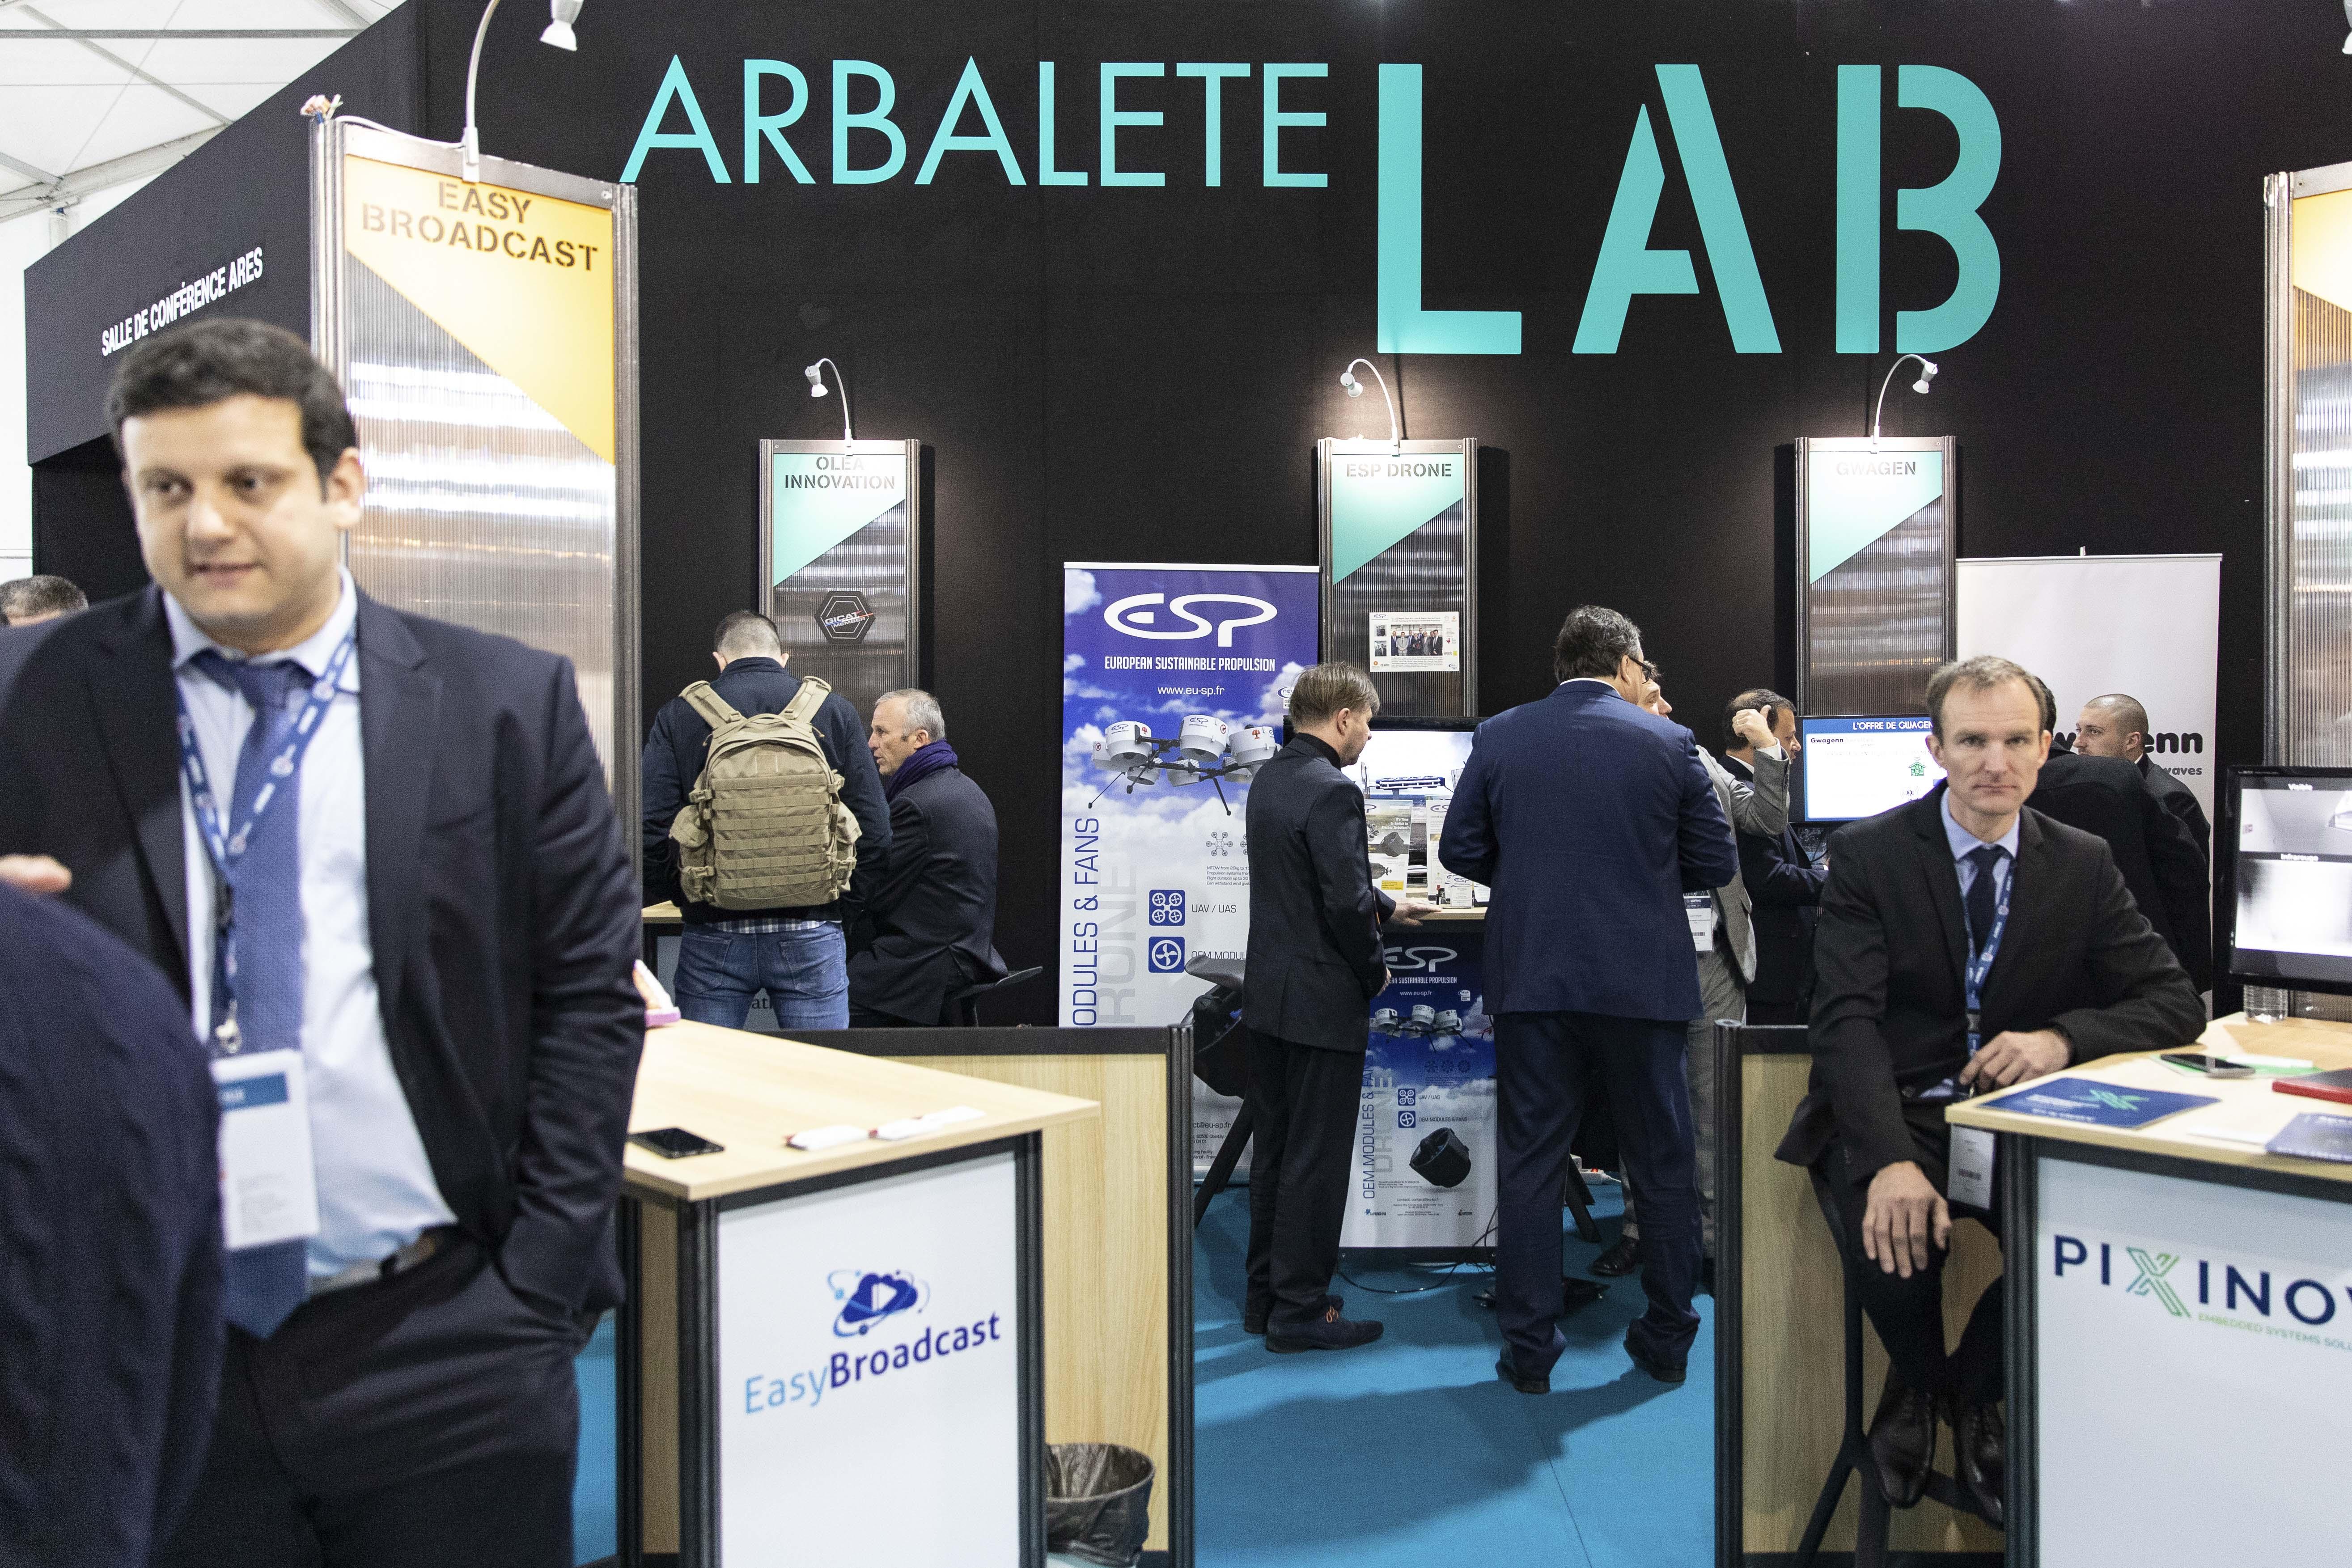 03 avril 2019-cercledelarbalete-sofins-mardi-arbaletelab-086